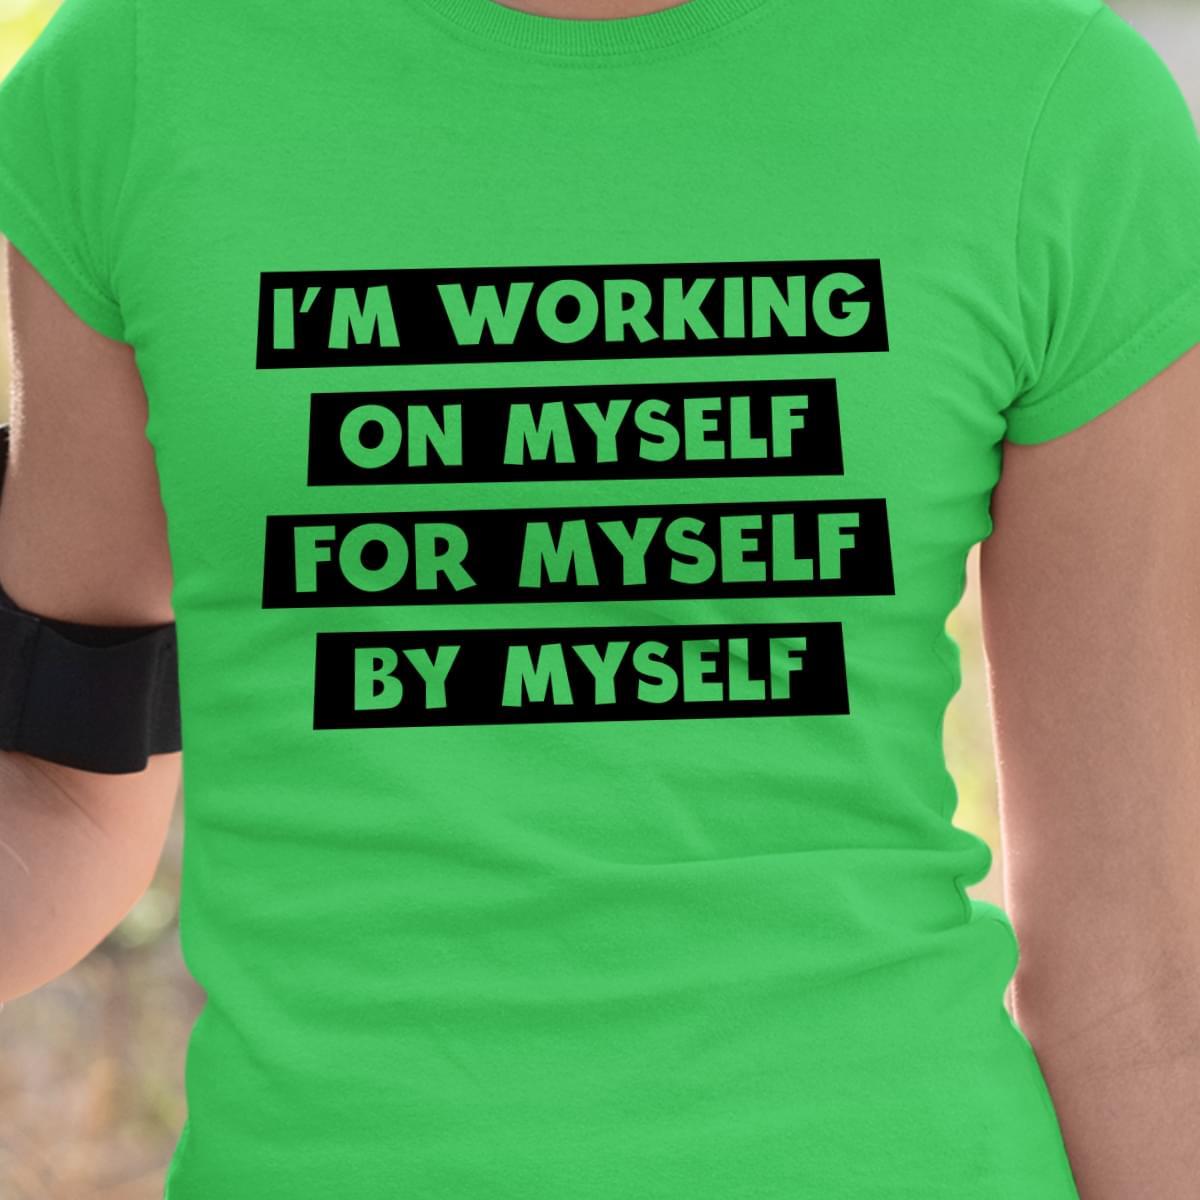 Im Working On Myself For Myself By Myself cotton t-shirt Hoodie Mug